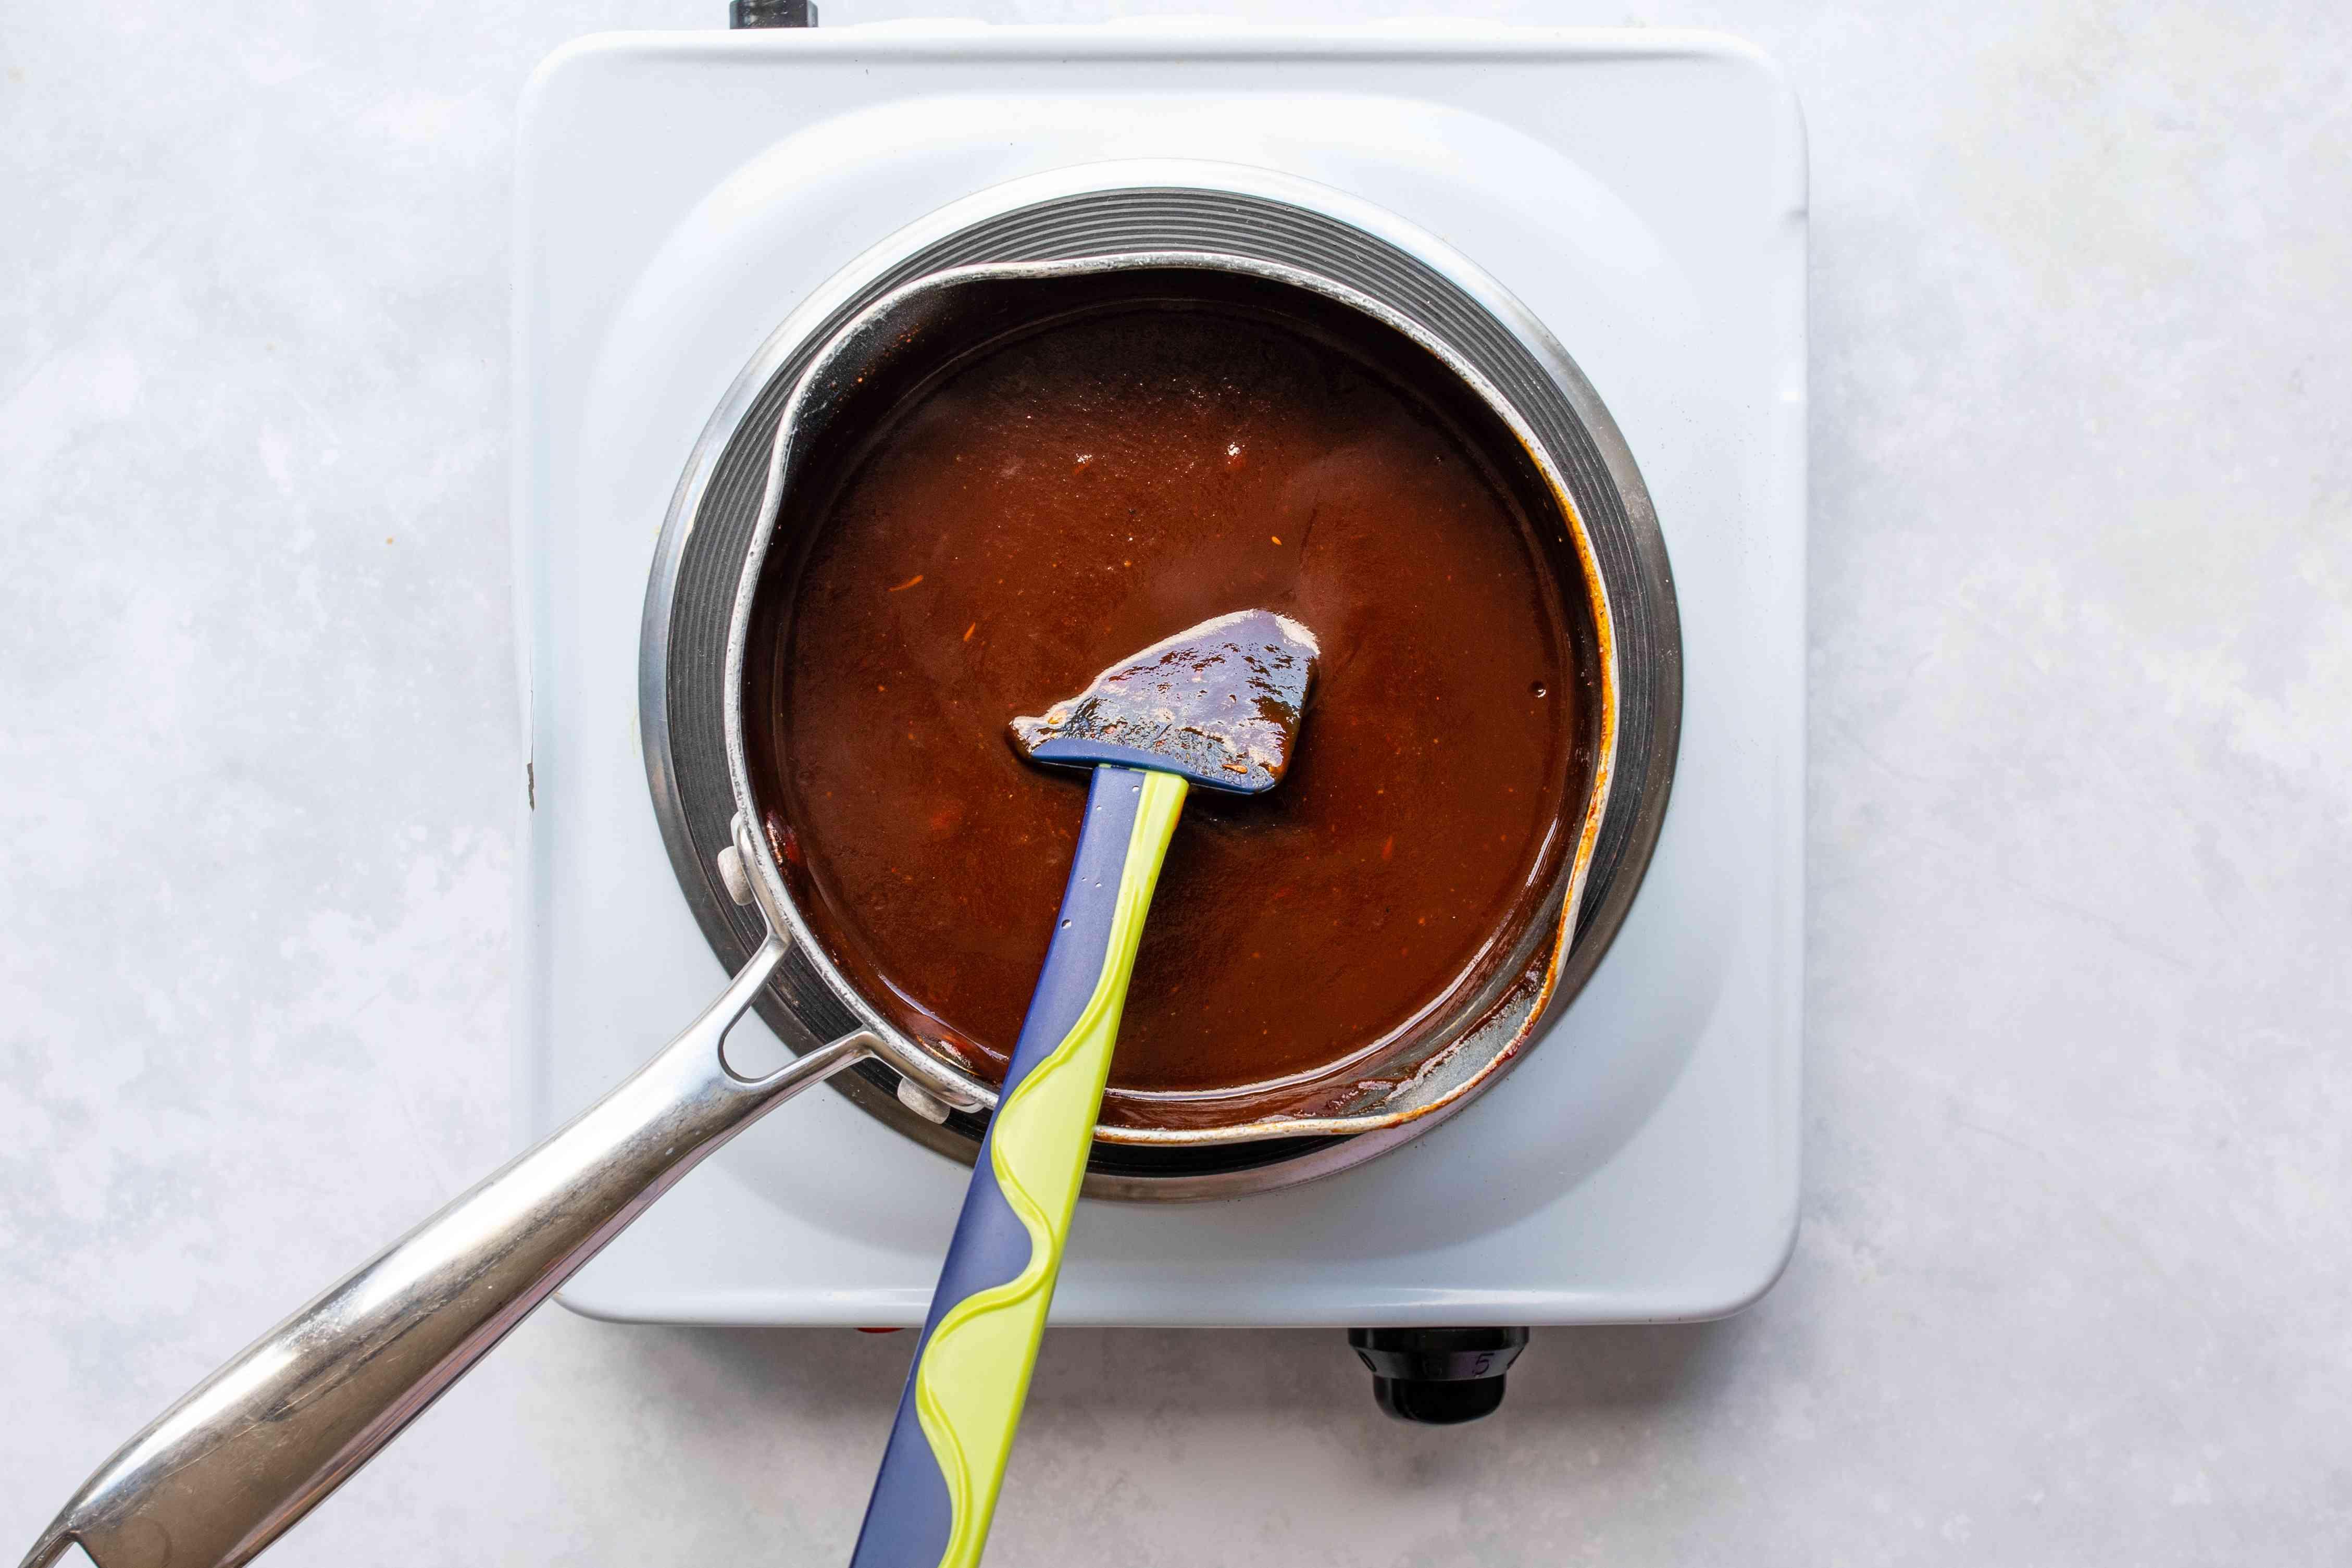 Reduce heat to medium low